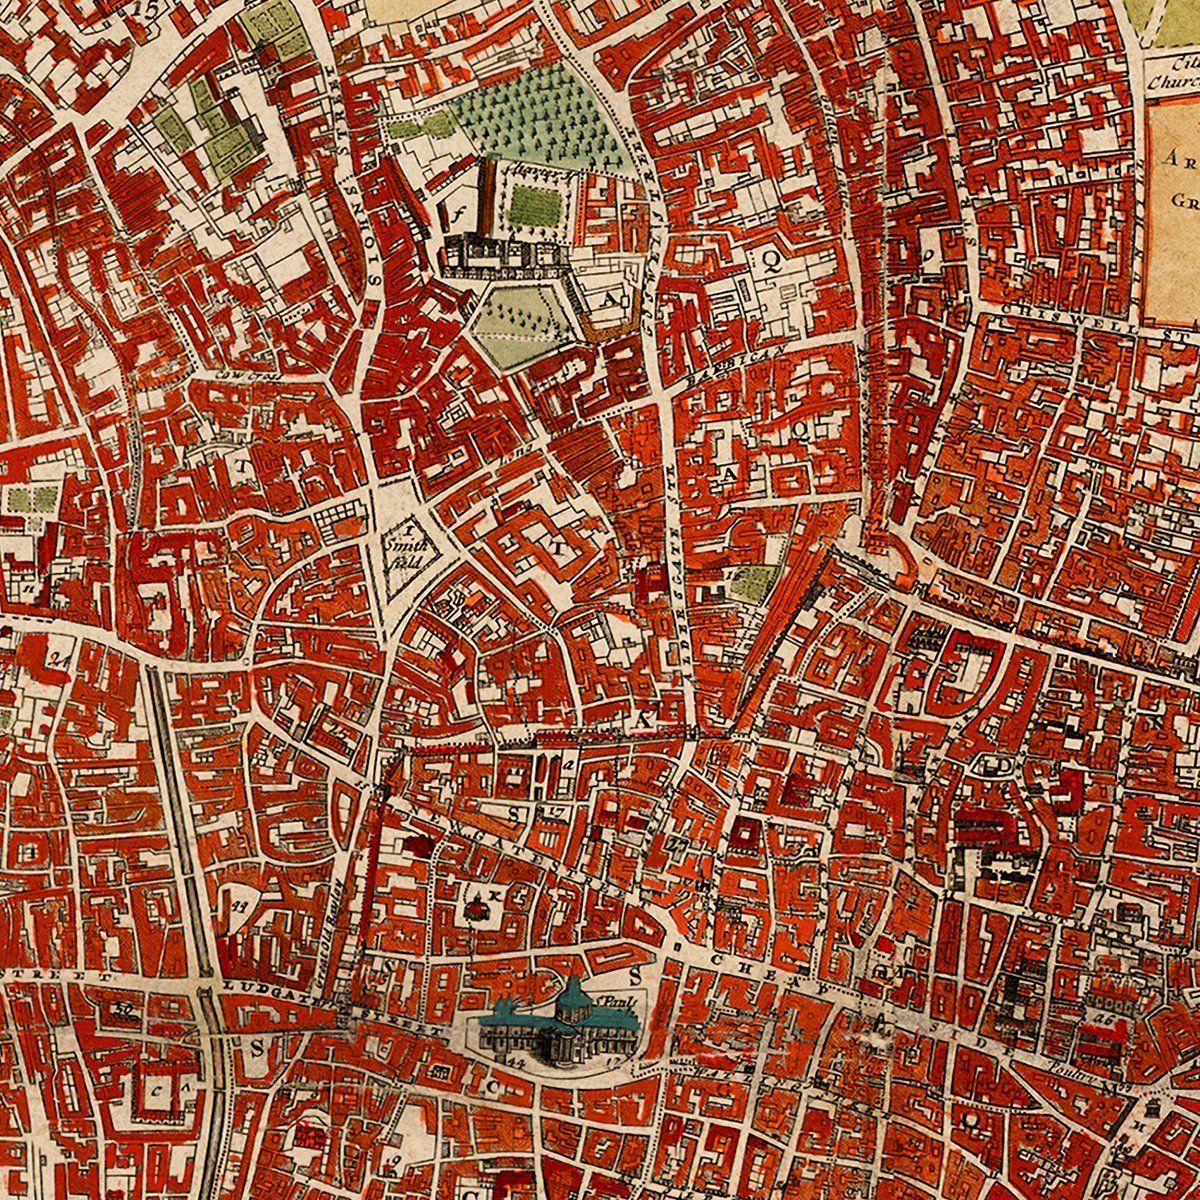 London ca 1700 Westminster Southwark Survey City Plan close Up